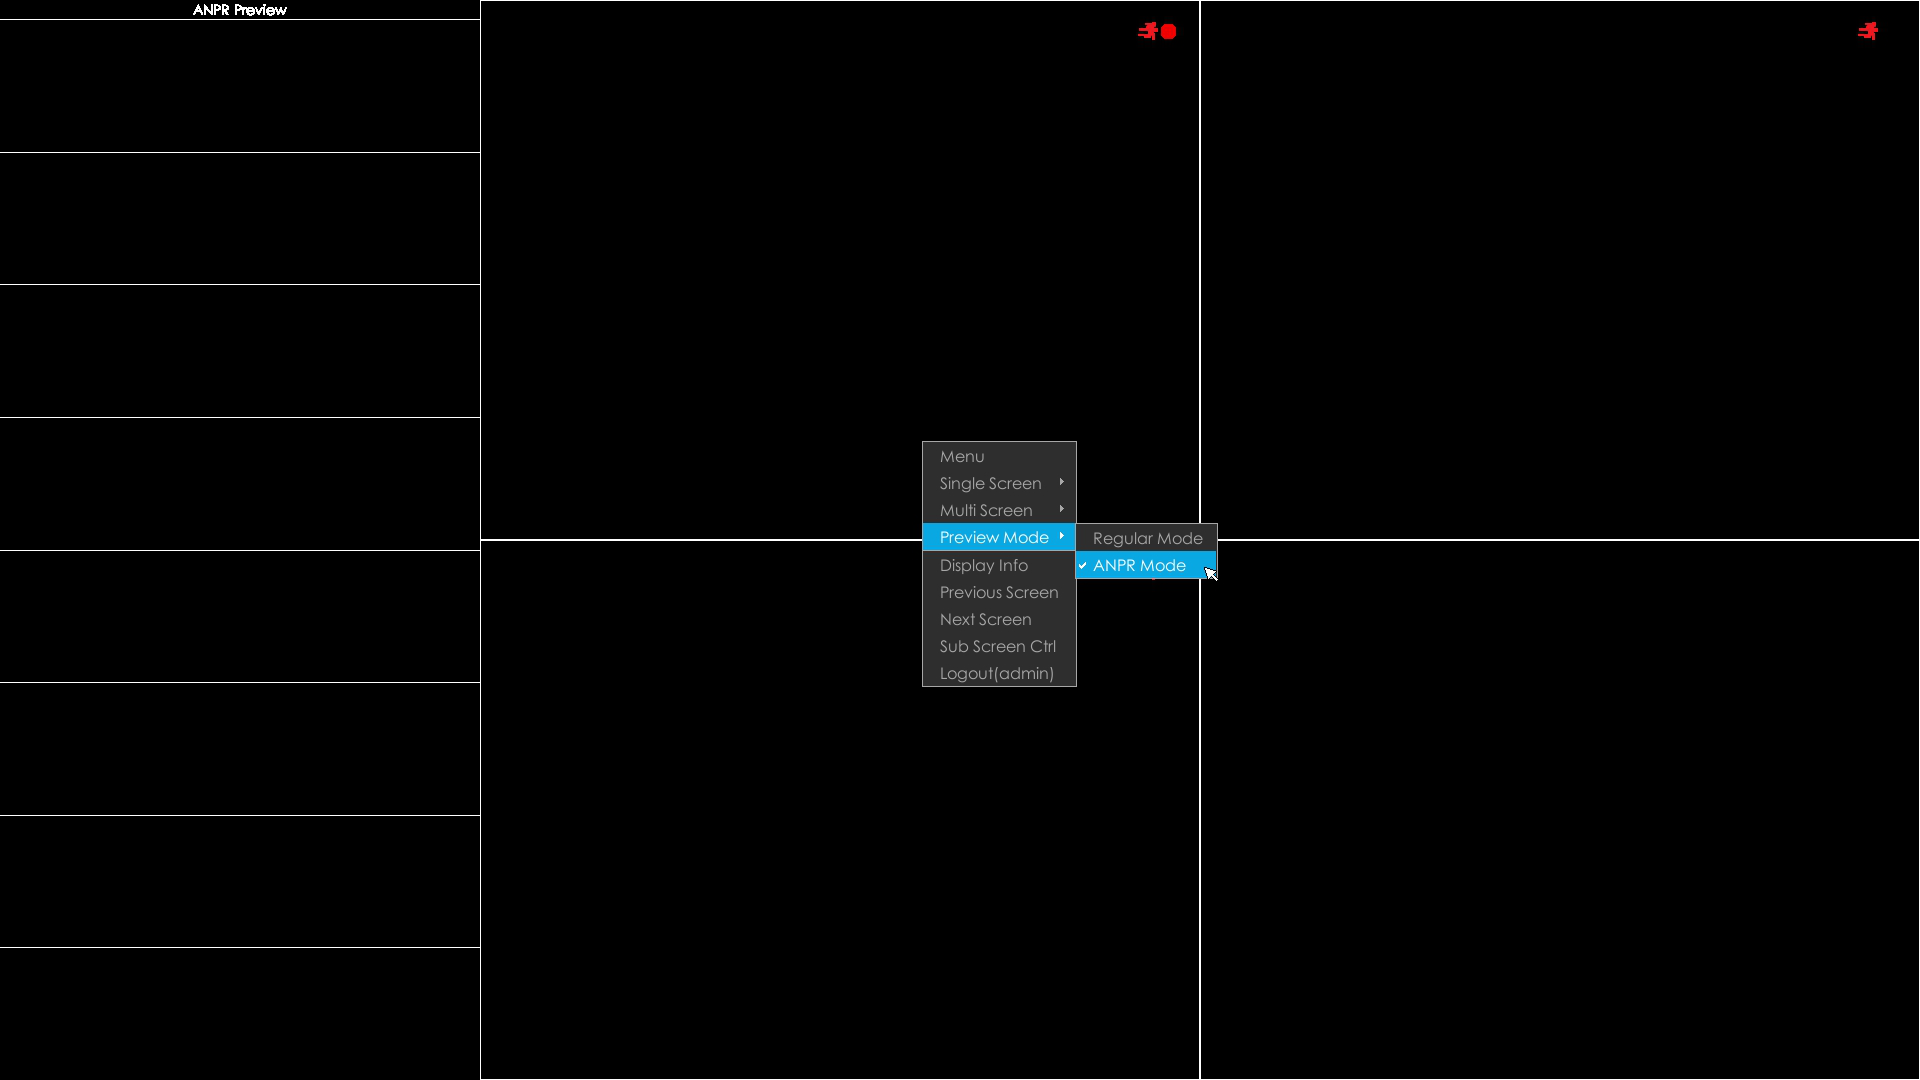 NVR QT viewing interface